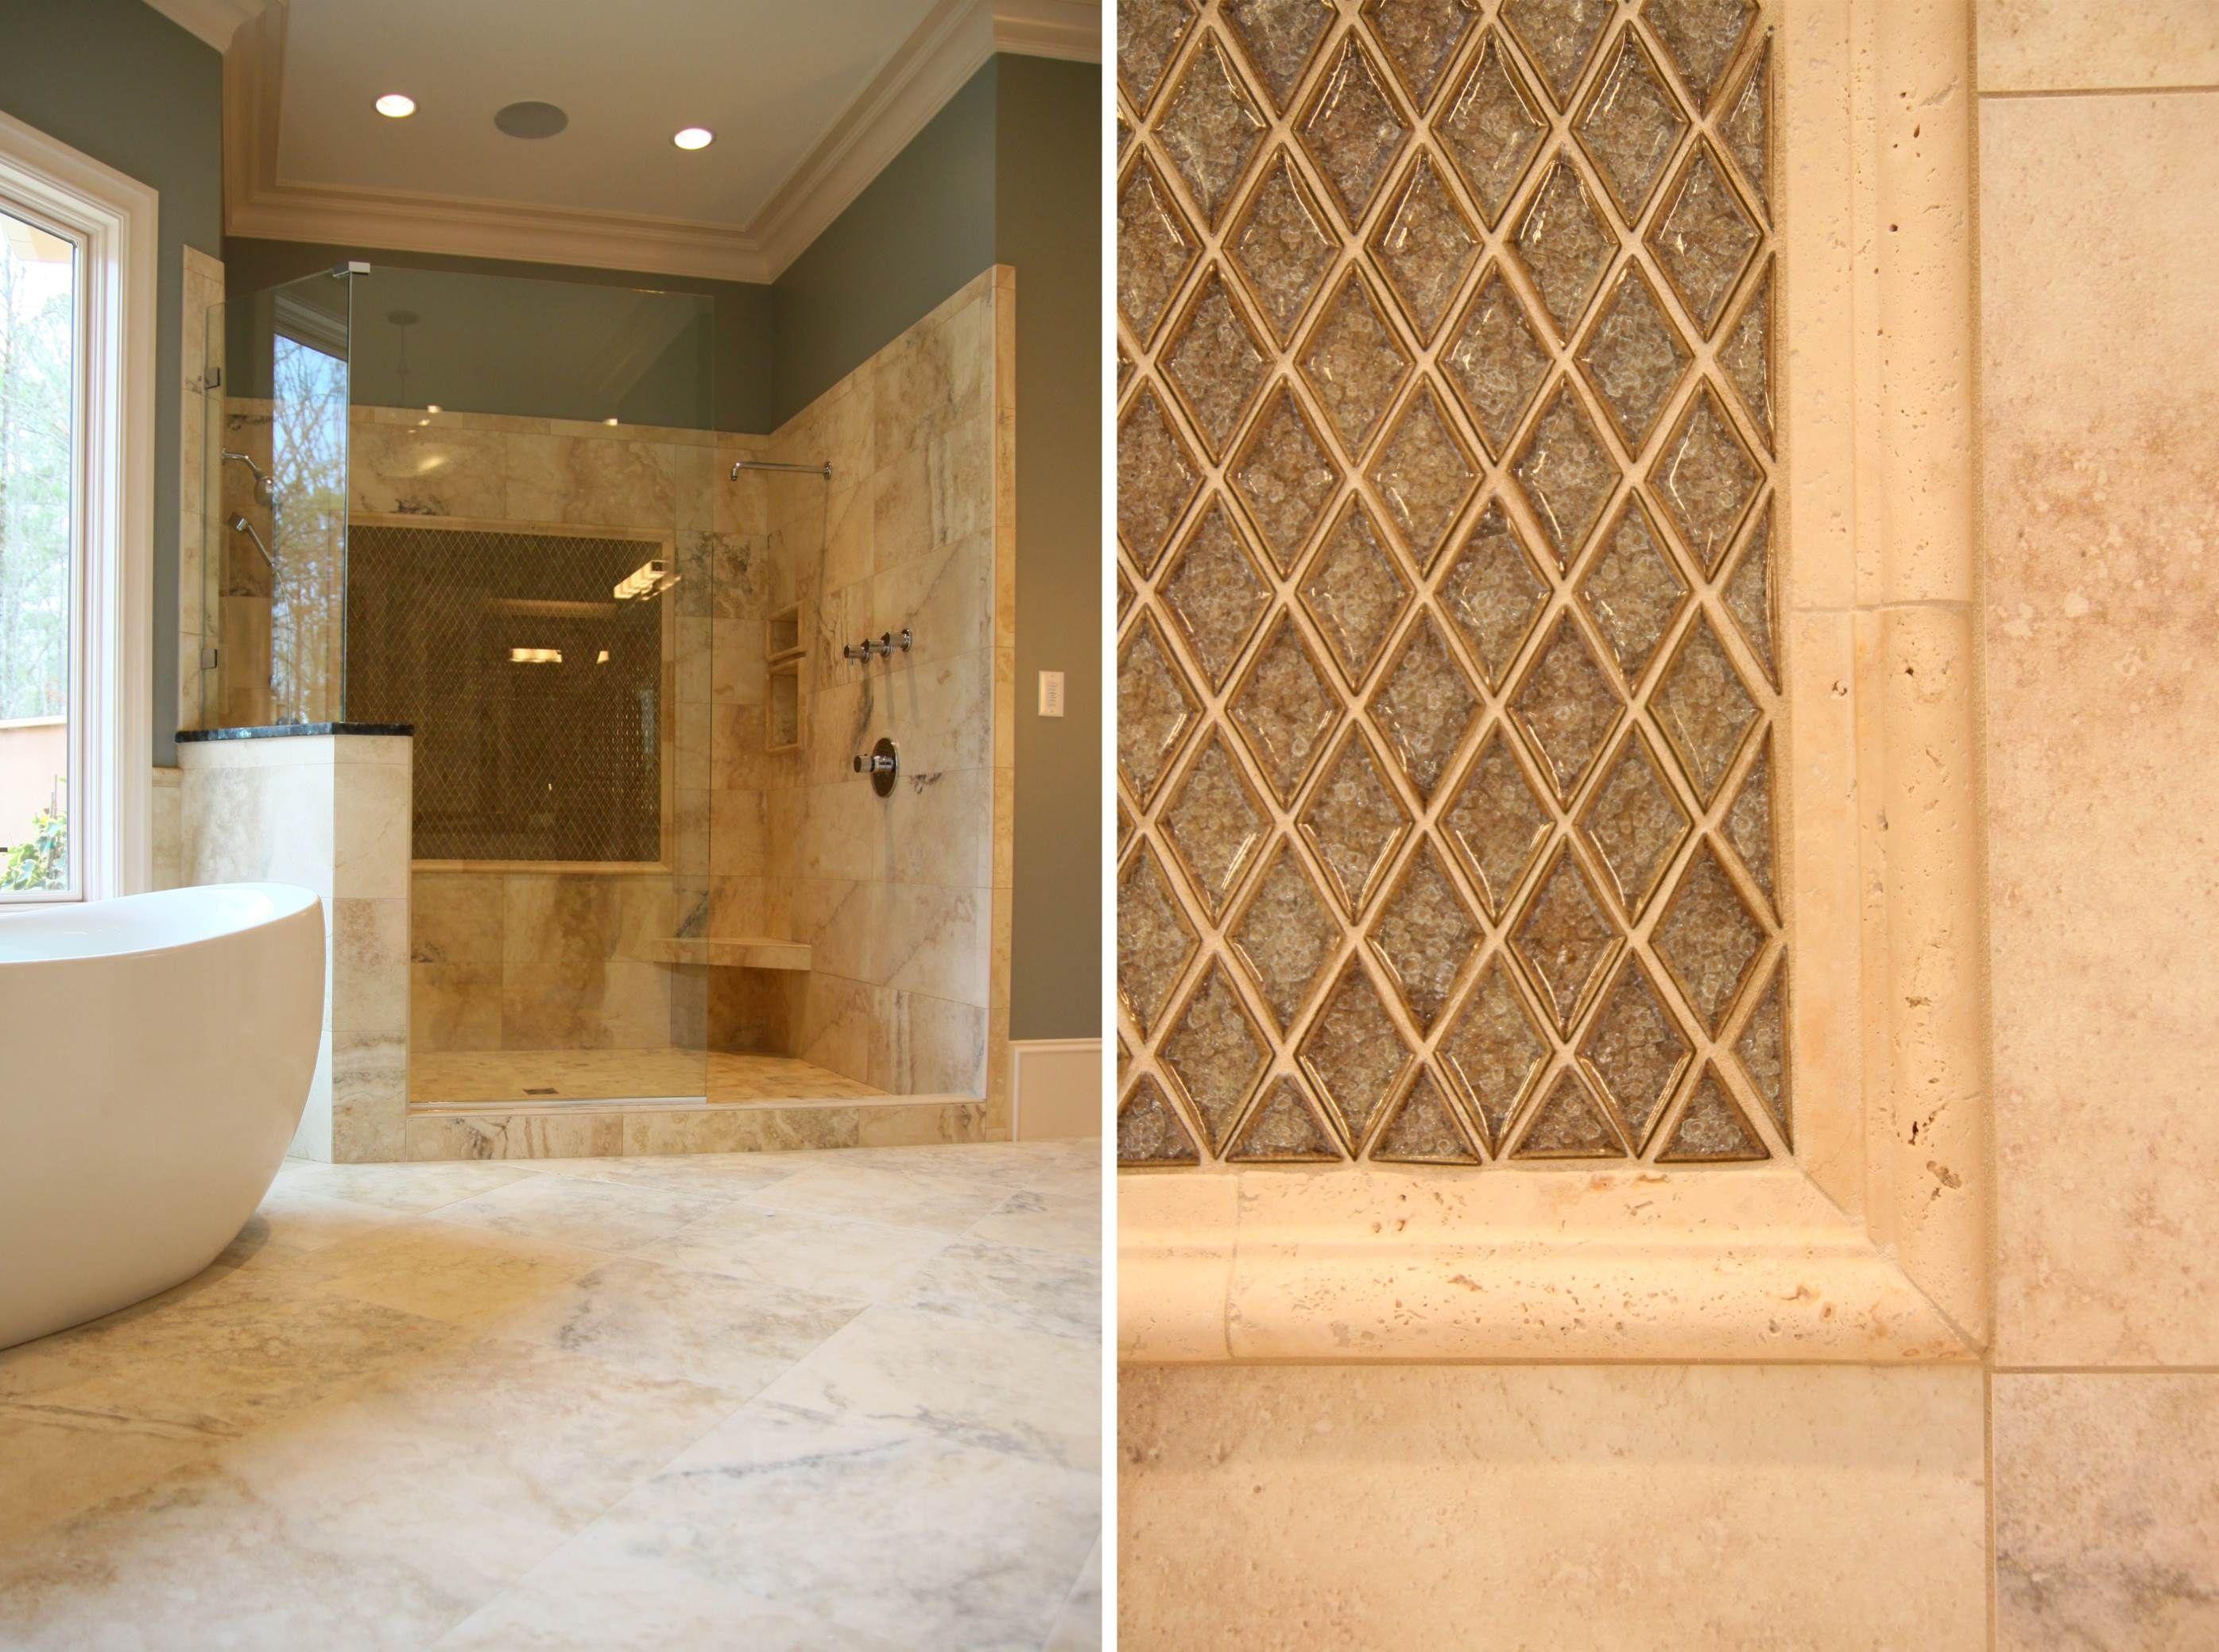 Home Depot Bath Reno Bathroom Ideas Pinterest - Home depot bathroom windows for bathroom decor ideas